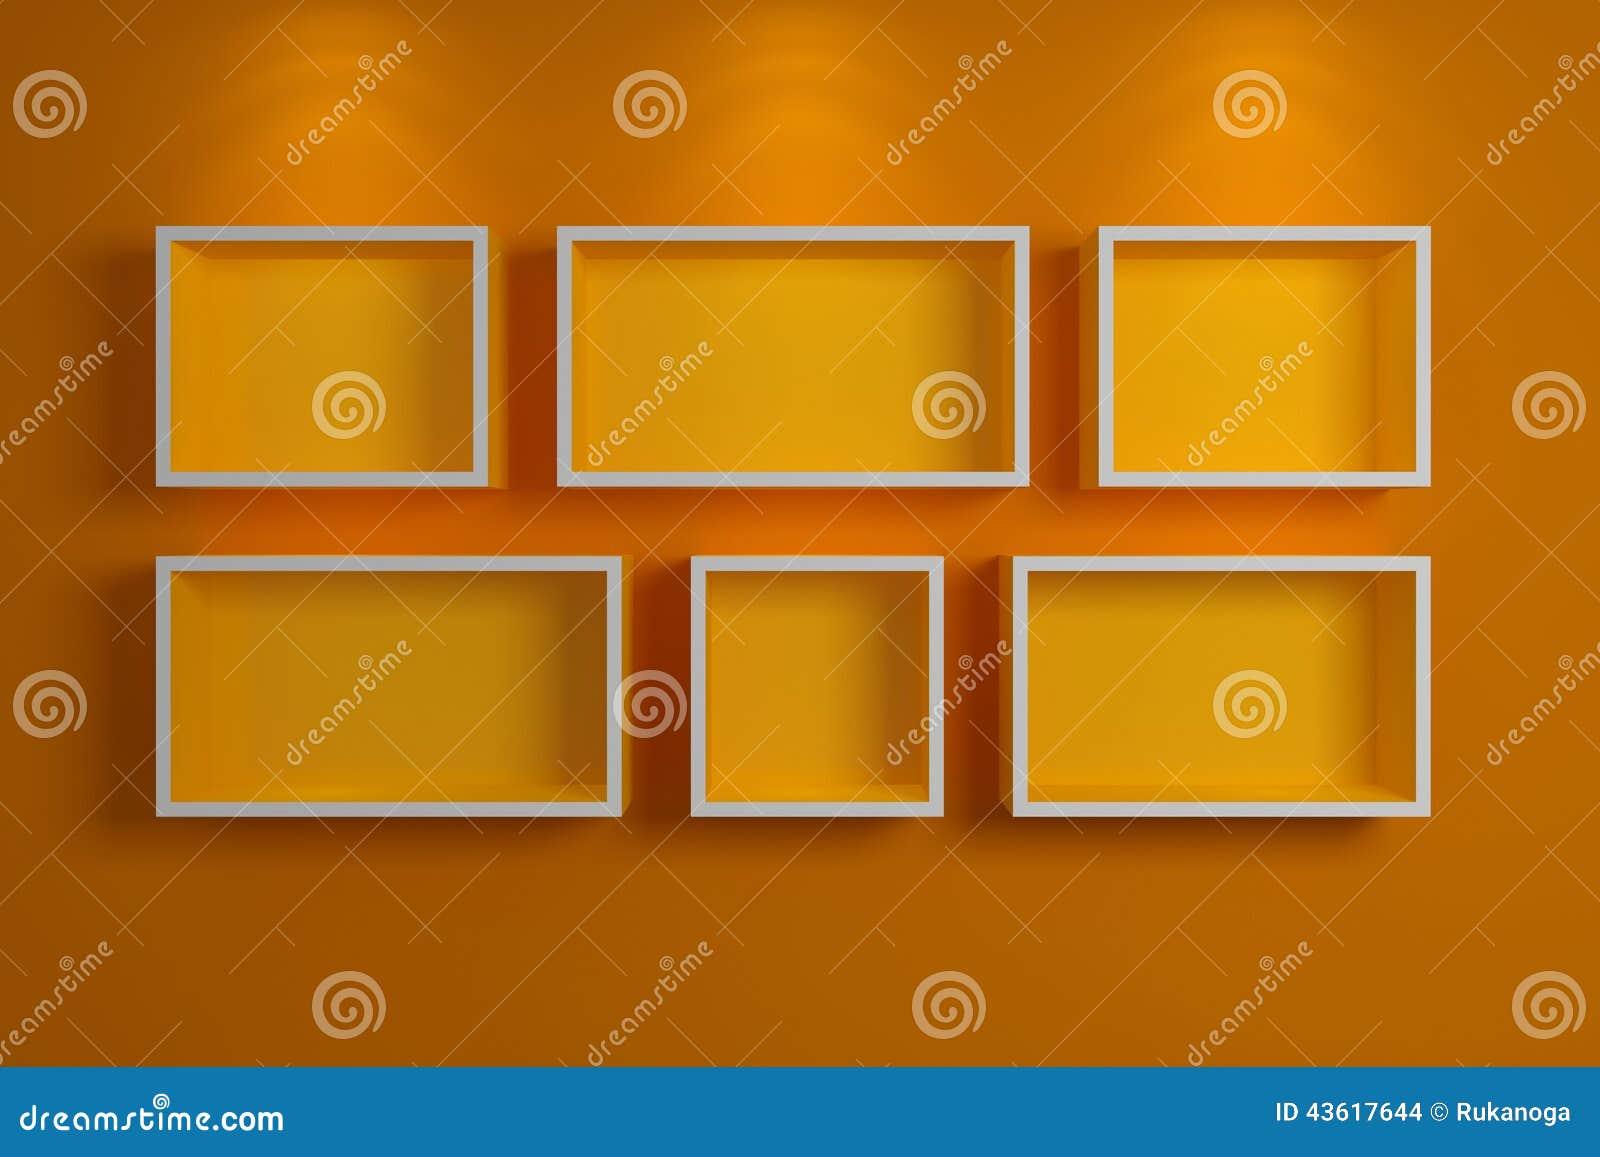 Modern shelf on a wall, stock illustration. Illustration of ...